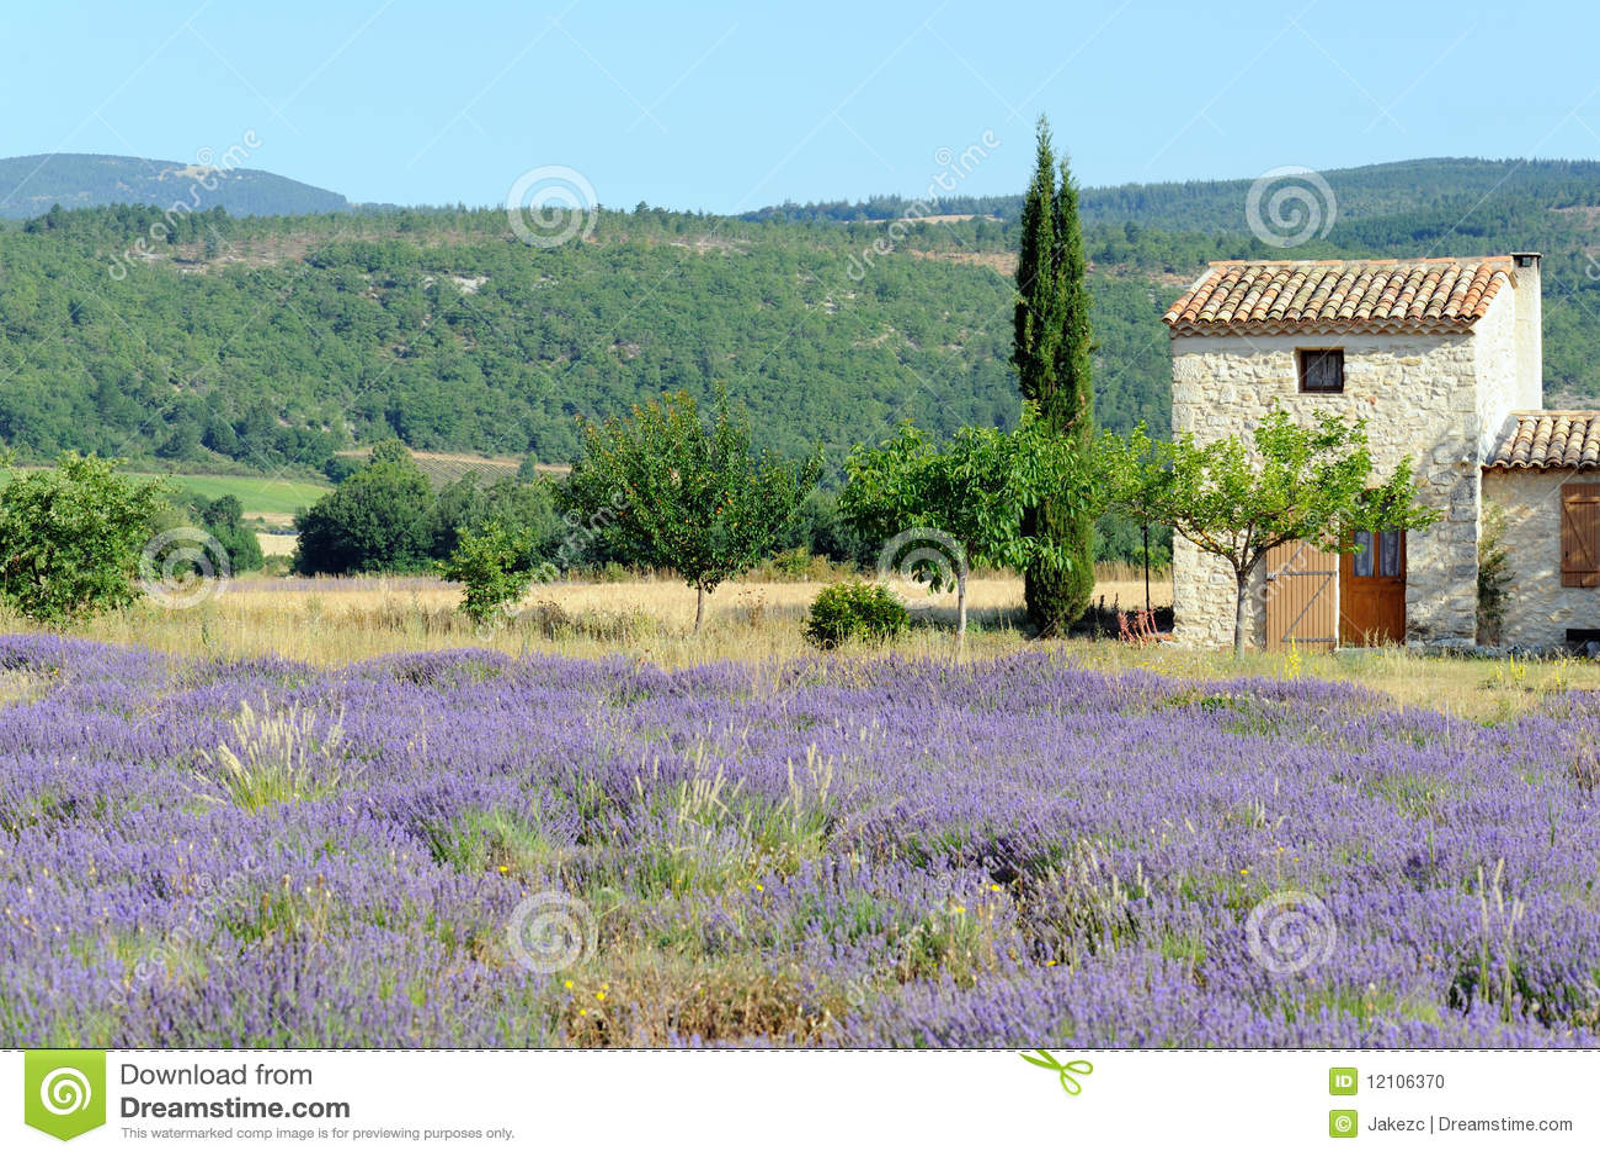 lavendel in provence frankreich stockfoto bild 12106370. Black Bedroom Furniture Sets. Home Design Ideas